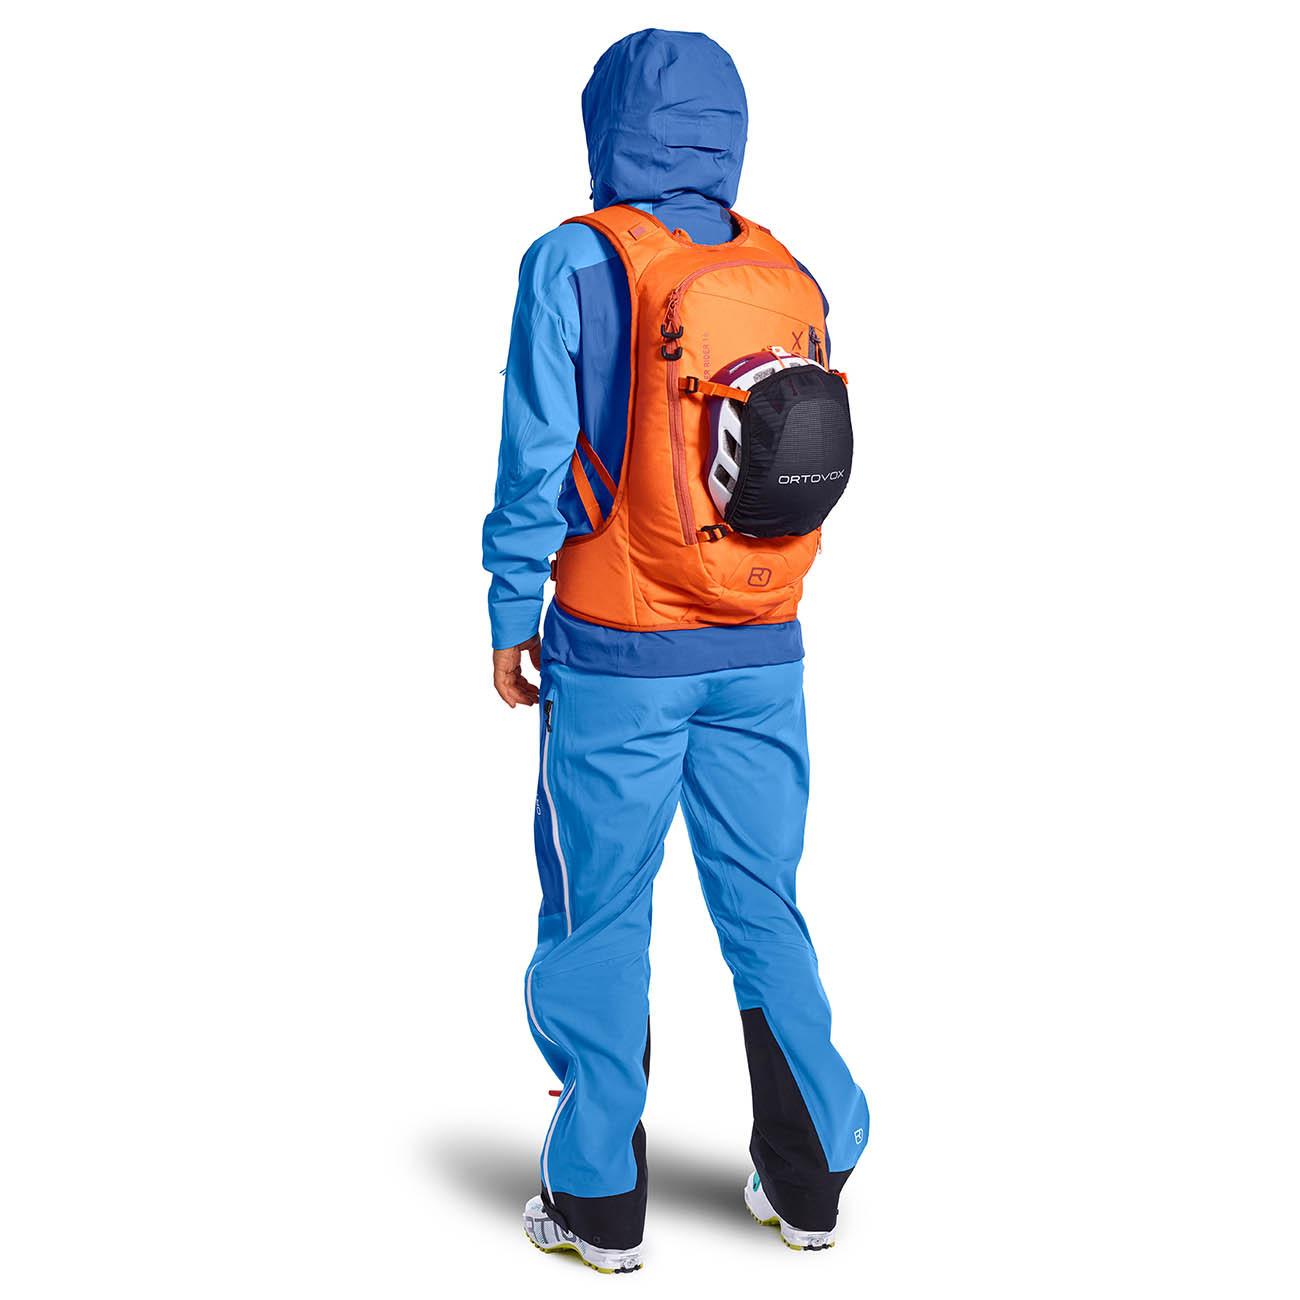 ortovox-powder-rider-16-burning-orange-uchycení lyží.jpg